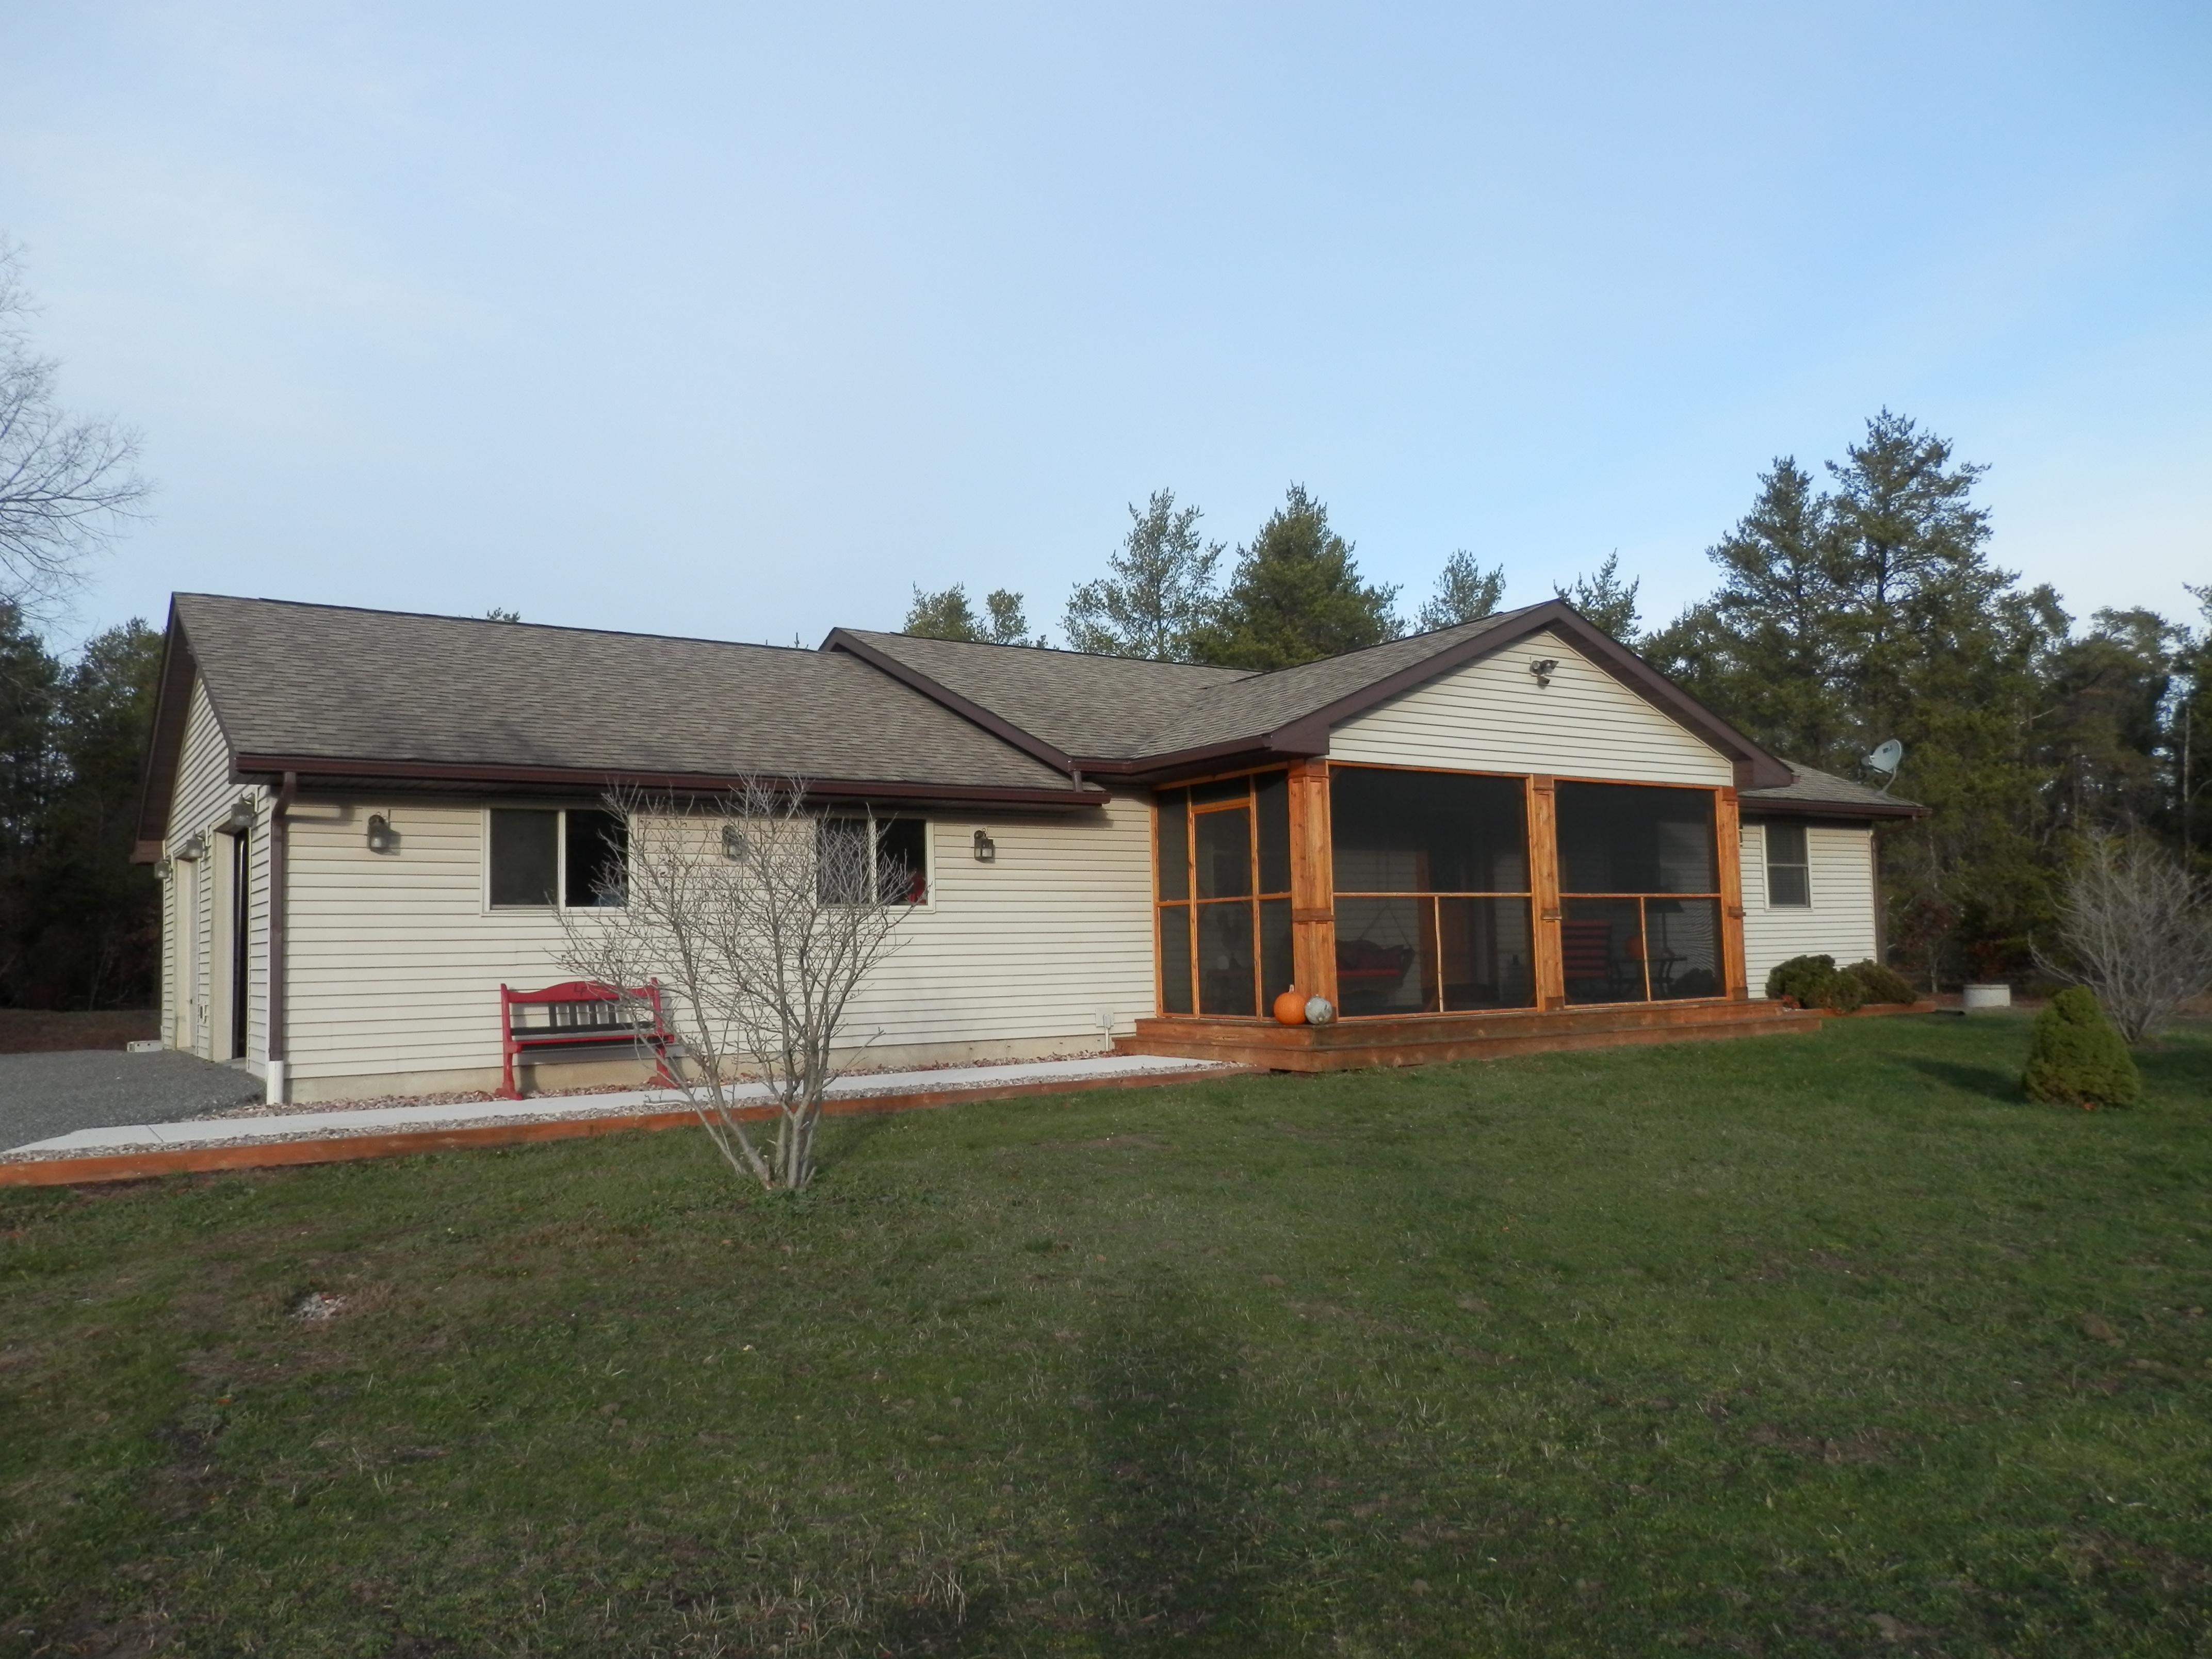 33391 Donna Mae Ln, Lone Rock, Wisconsin 53556